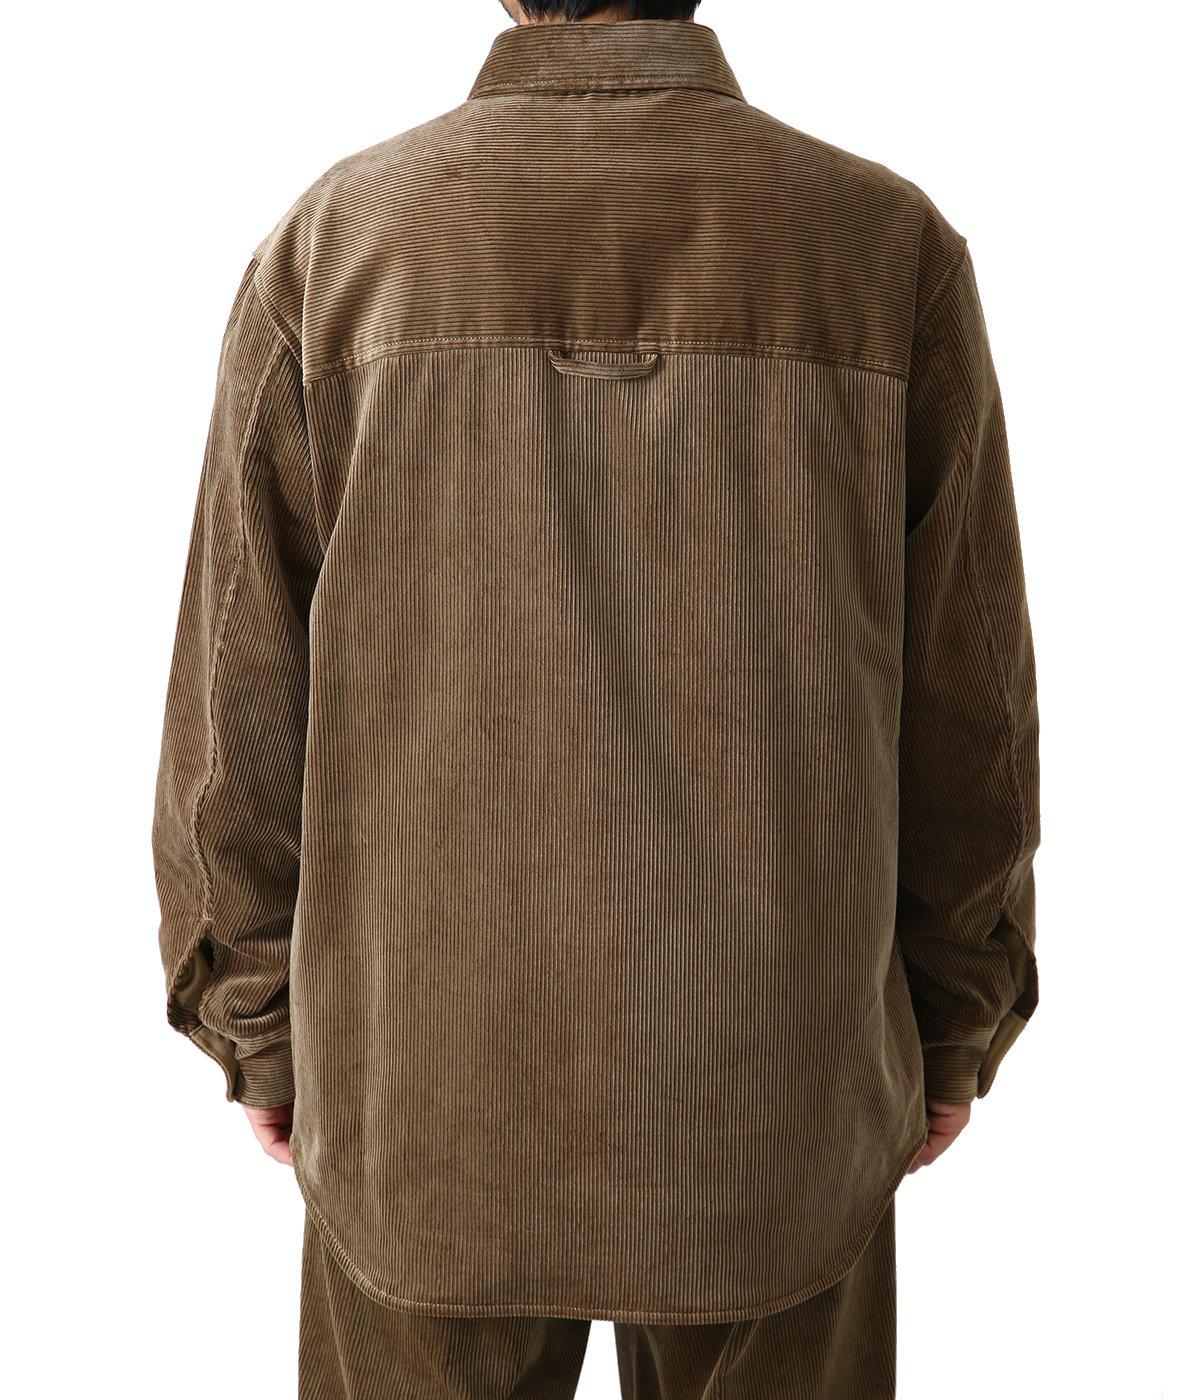 Cotton Corduroy Over Shirt